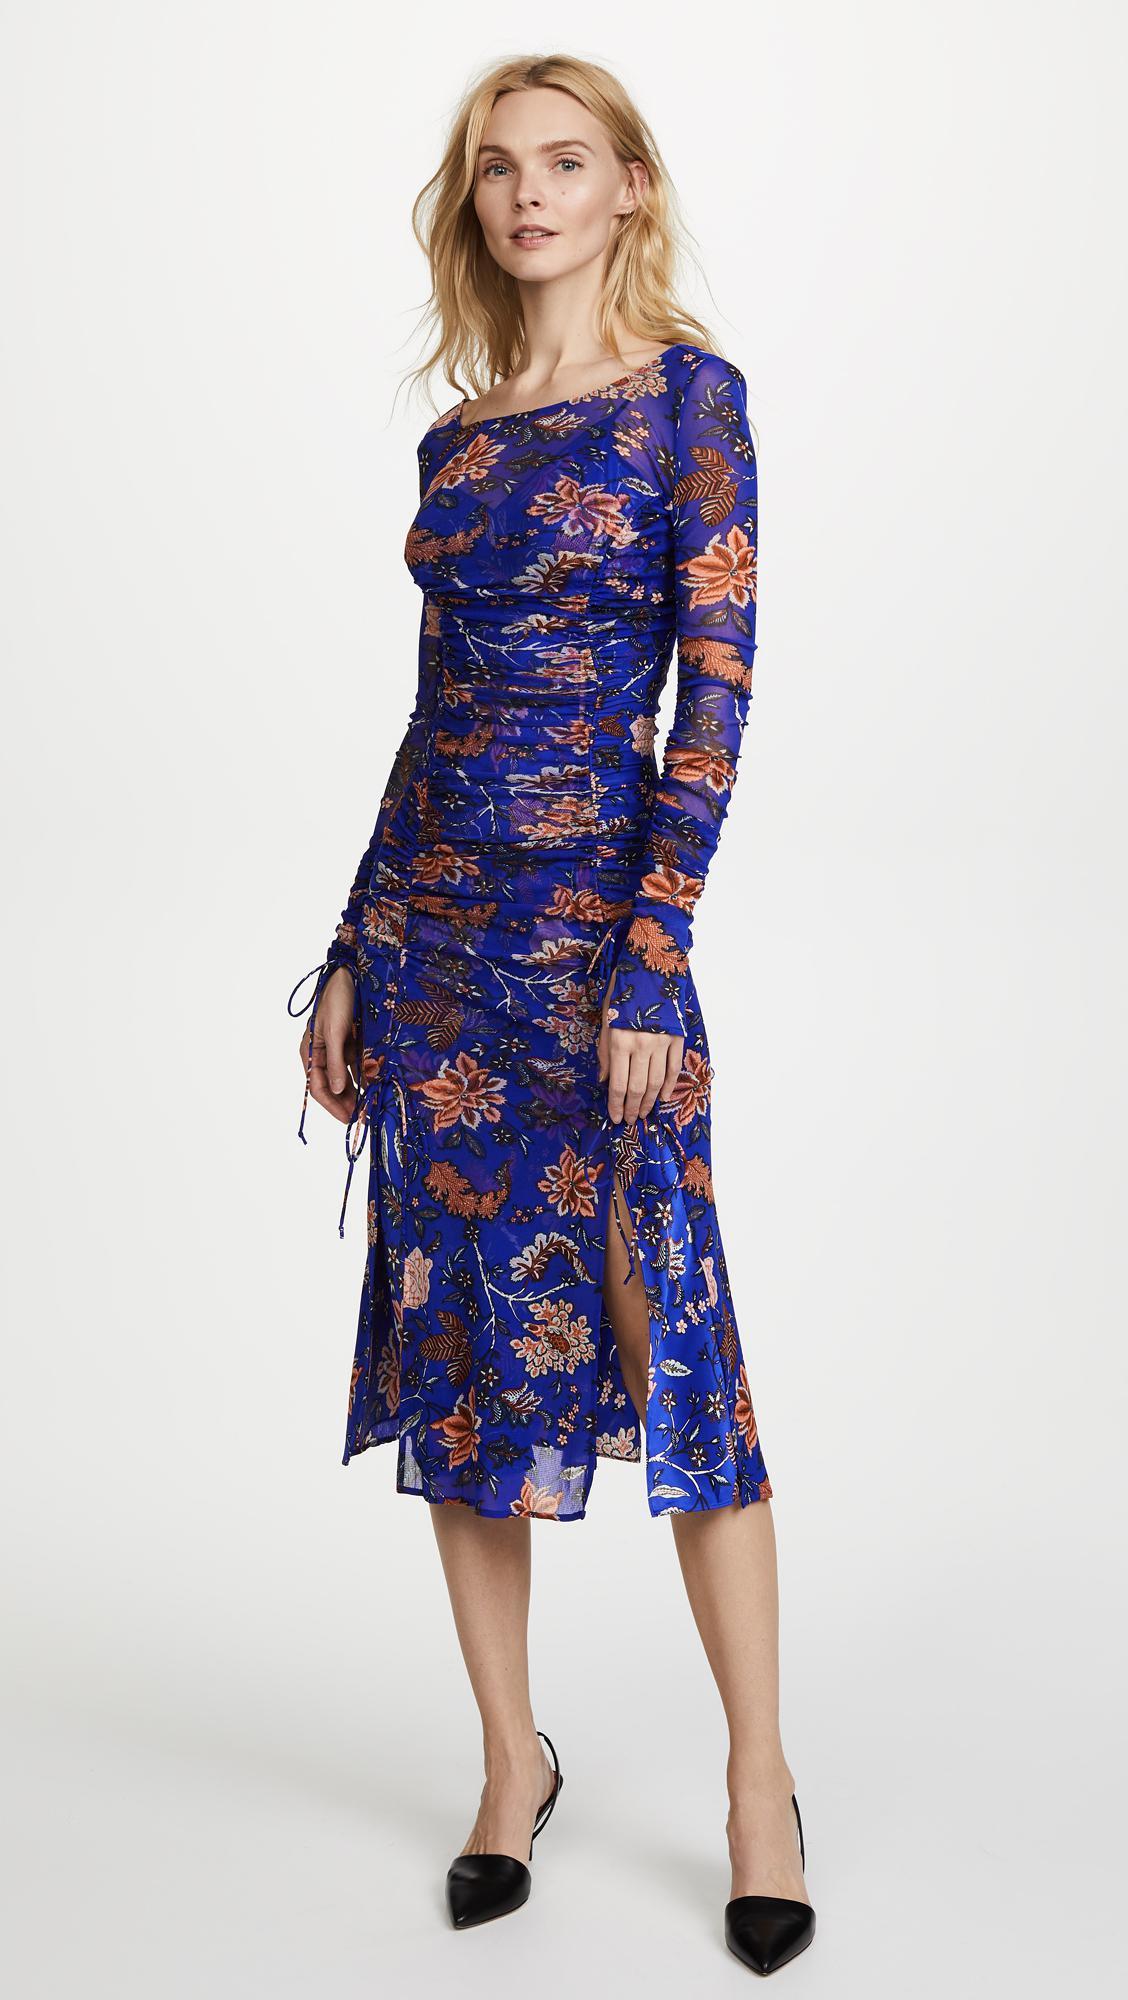 lyst diane von furstenberg overlay mesh dress in blue. Black Bedroom Furniture Sets. Home Design Ideas